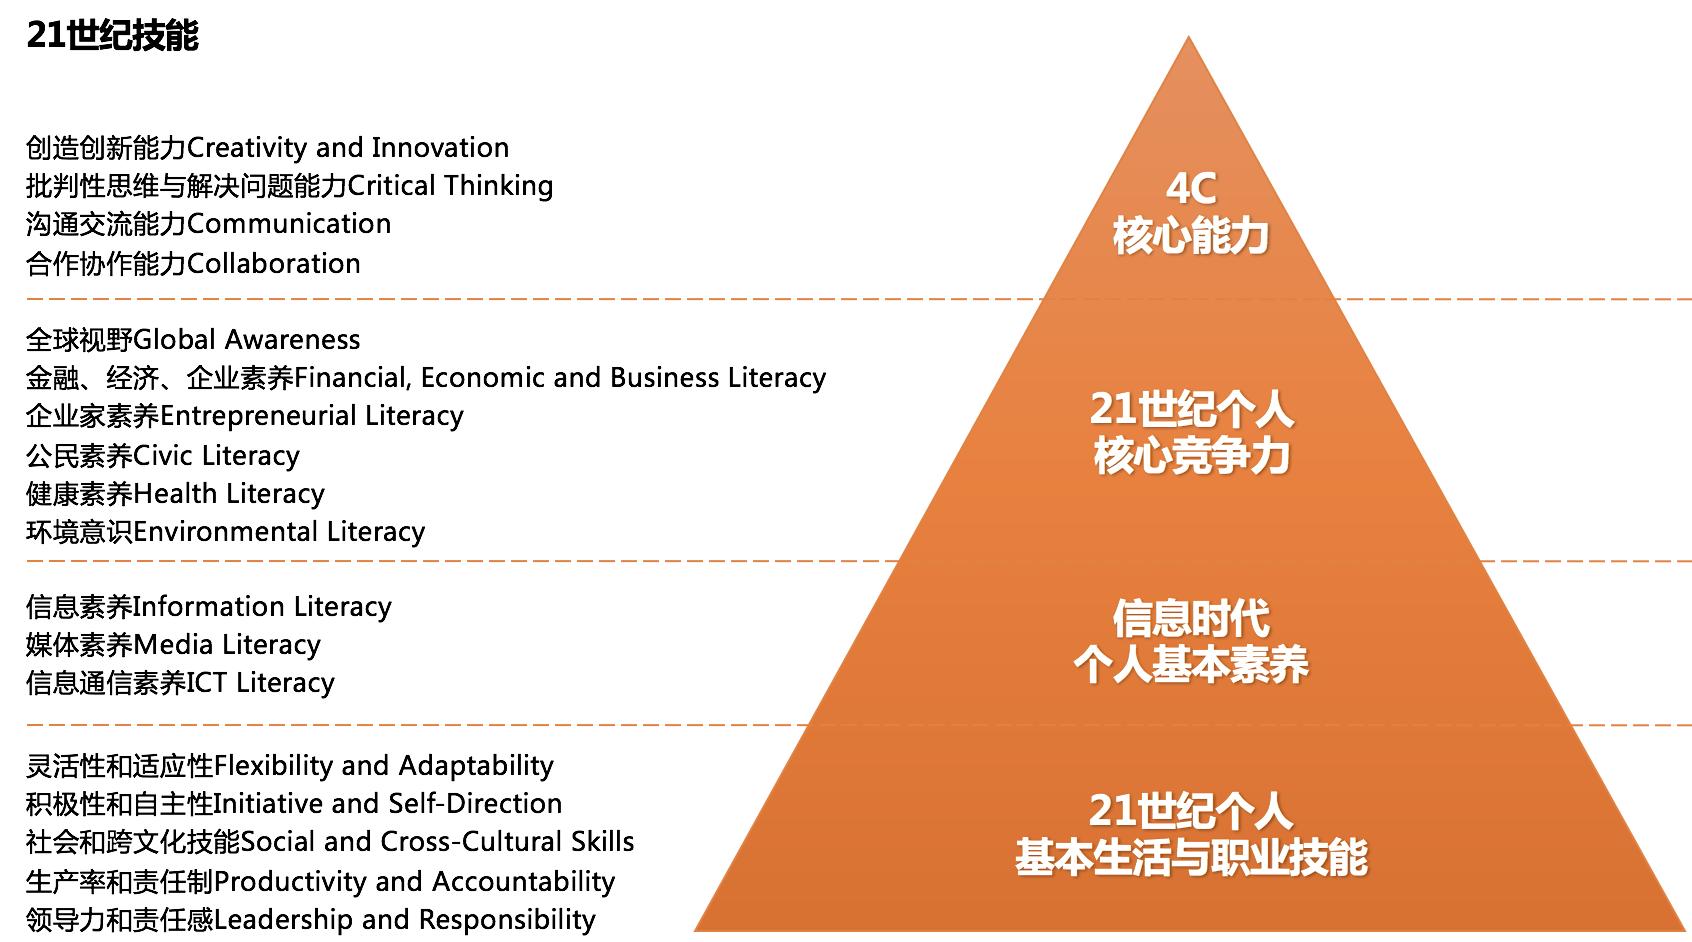 【GET·夏】北师大李玉顺:教育信息化2.0重点关注质变,引领生态变革